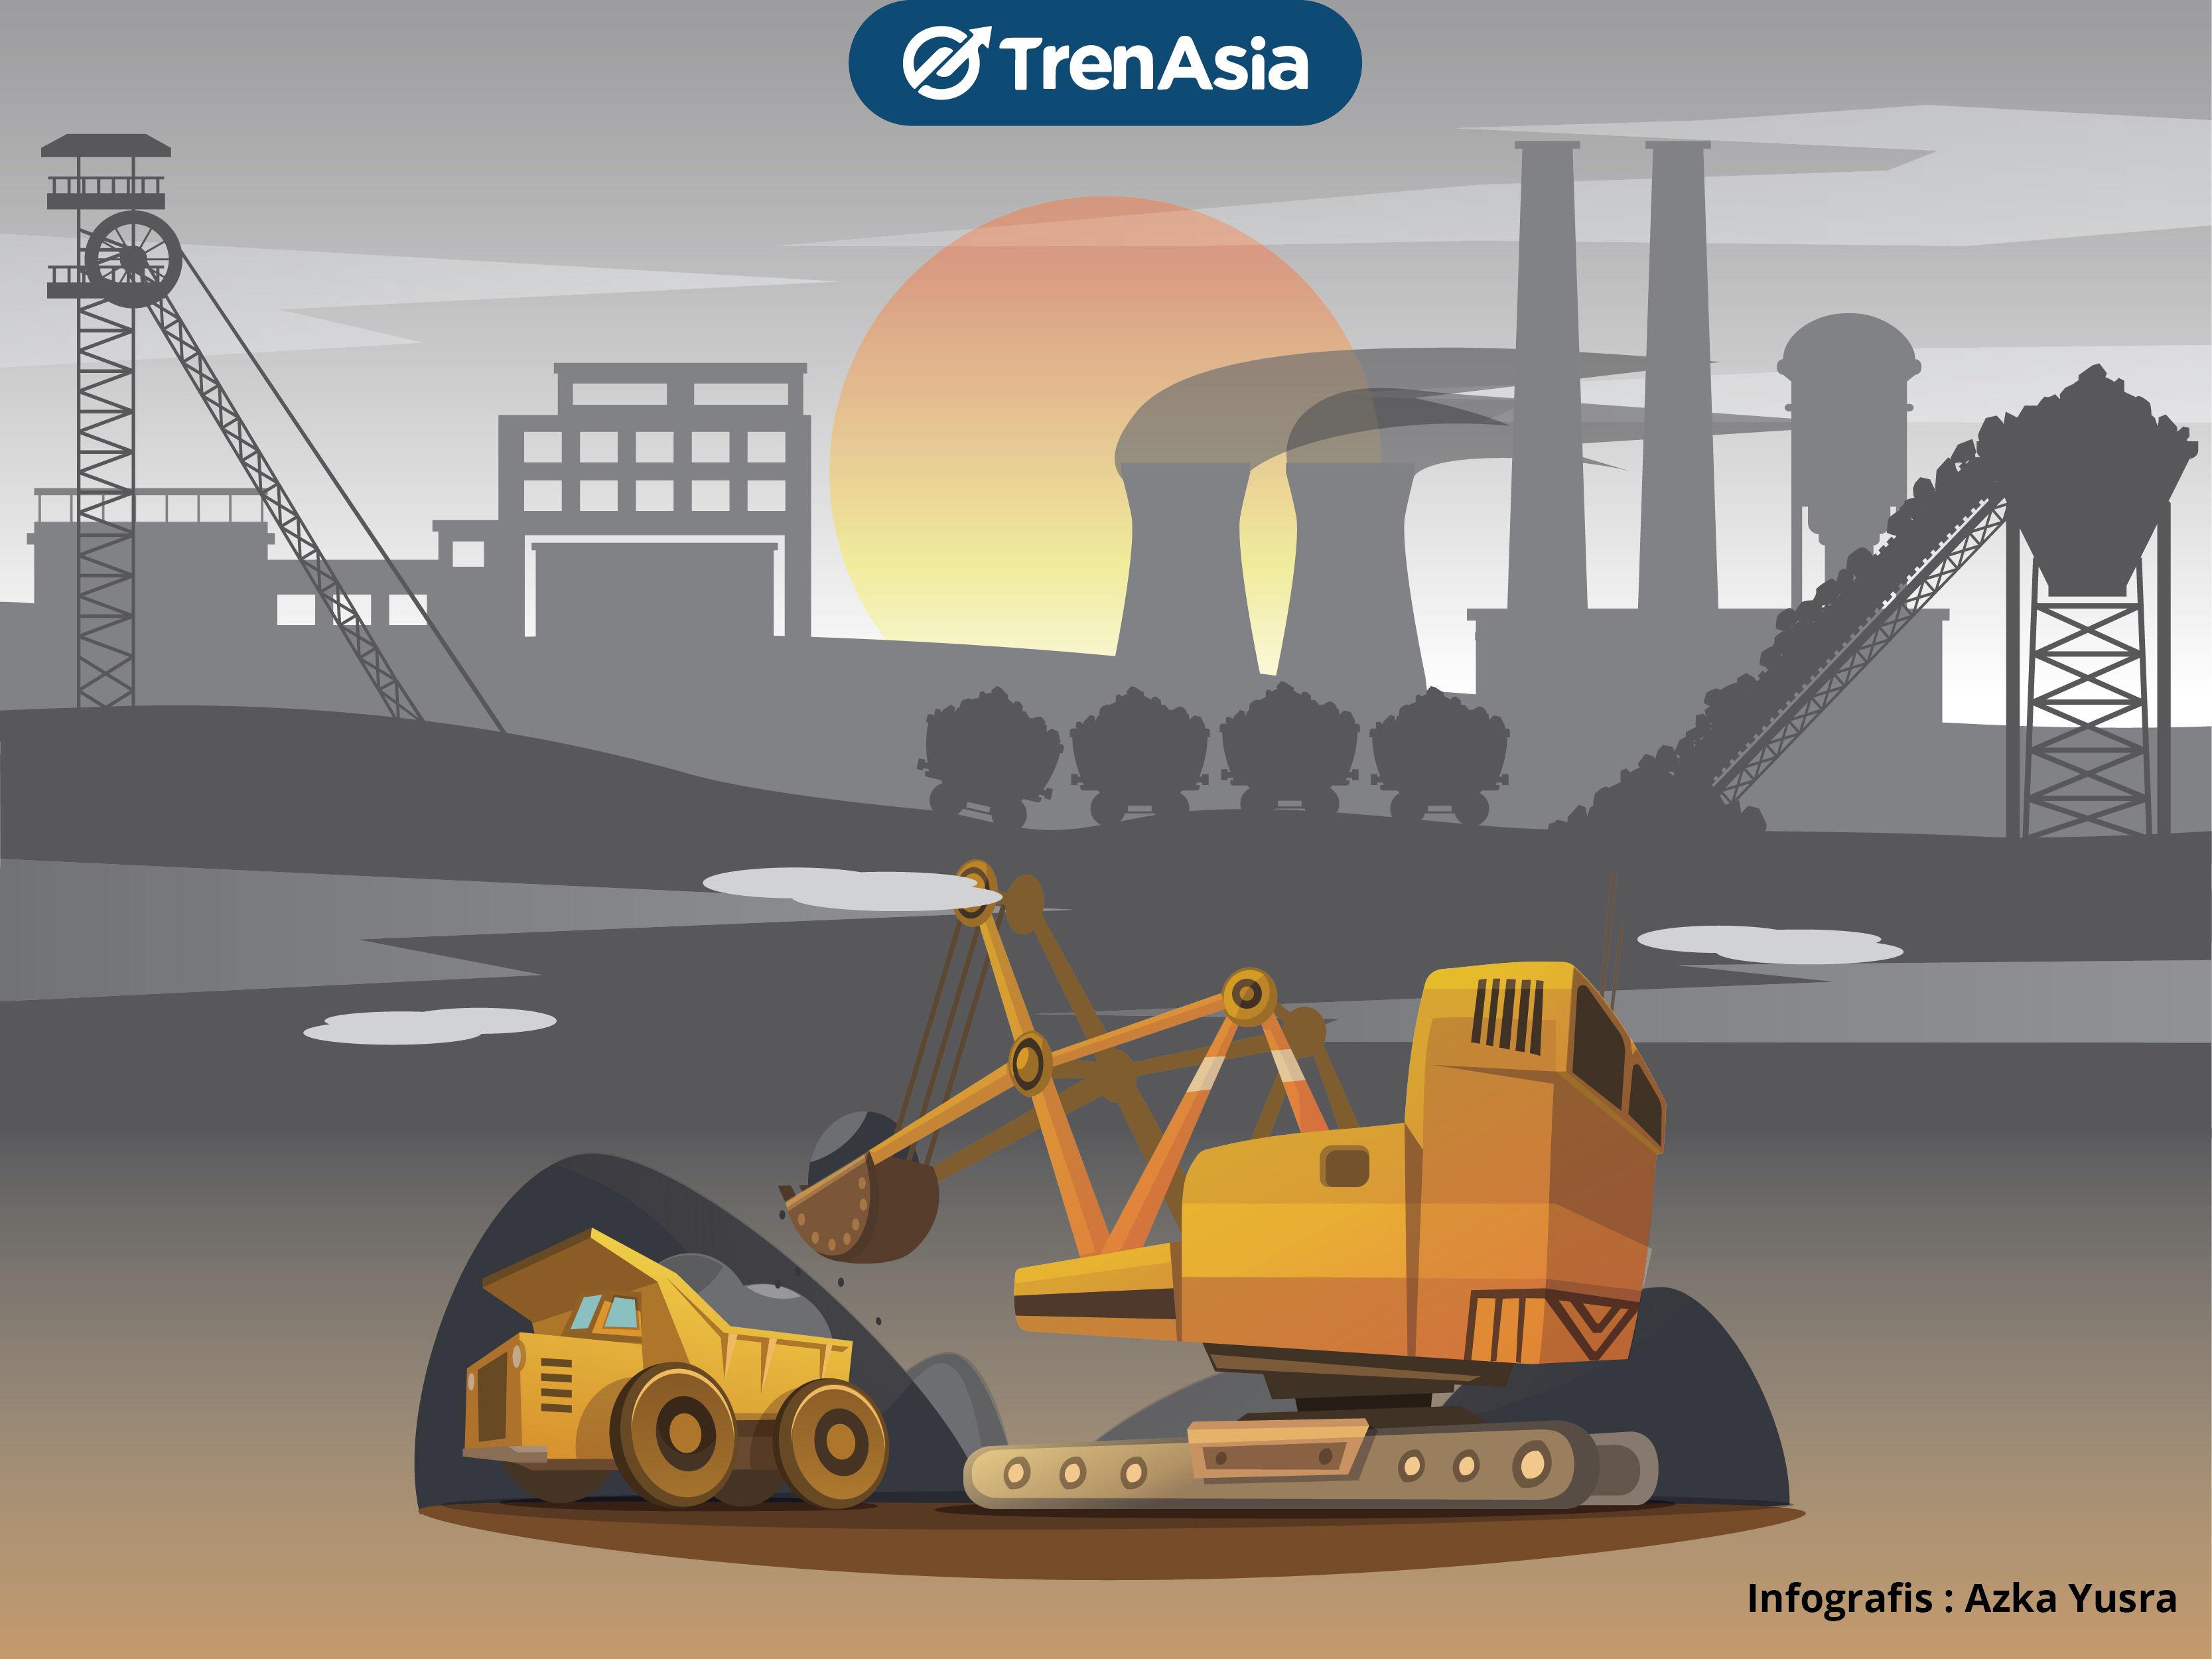 Harga Batu Bara Diprediksi Tembus US$190 pada Kuartal IV-2021, Emiten Makin Cuan?